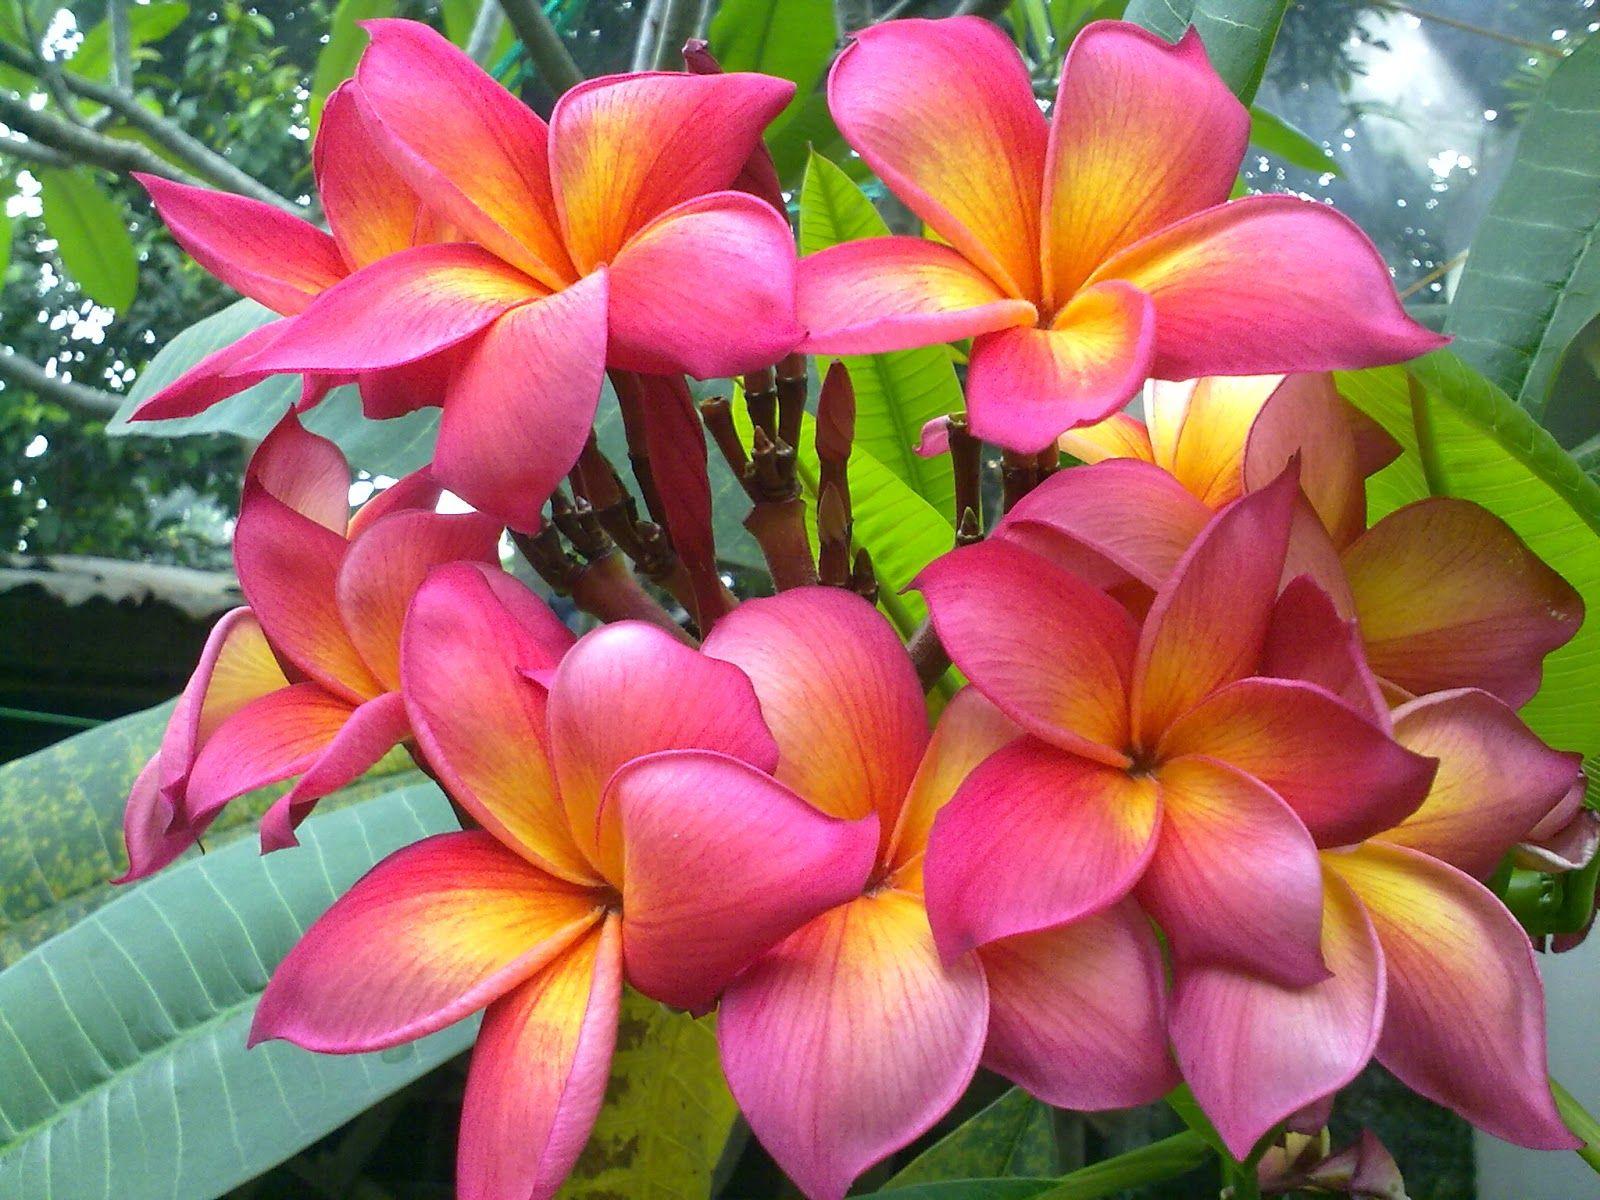 Bunga Kamboja http://flowersandbunga.blogspot.com/2014/03